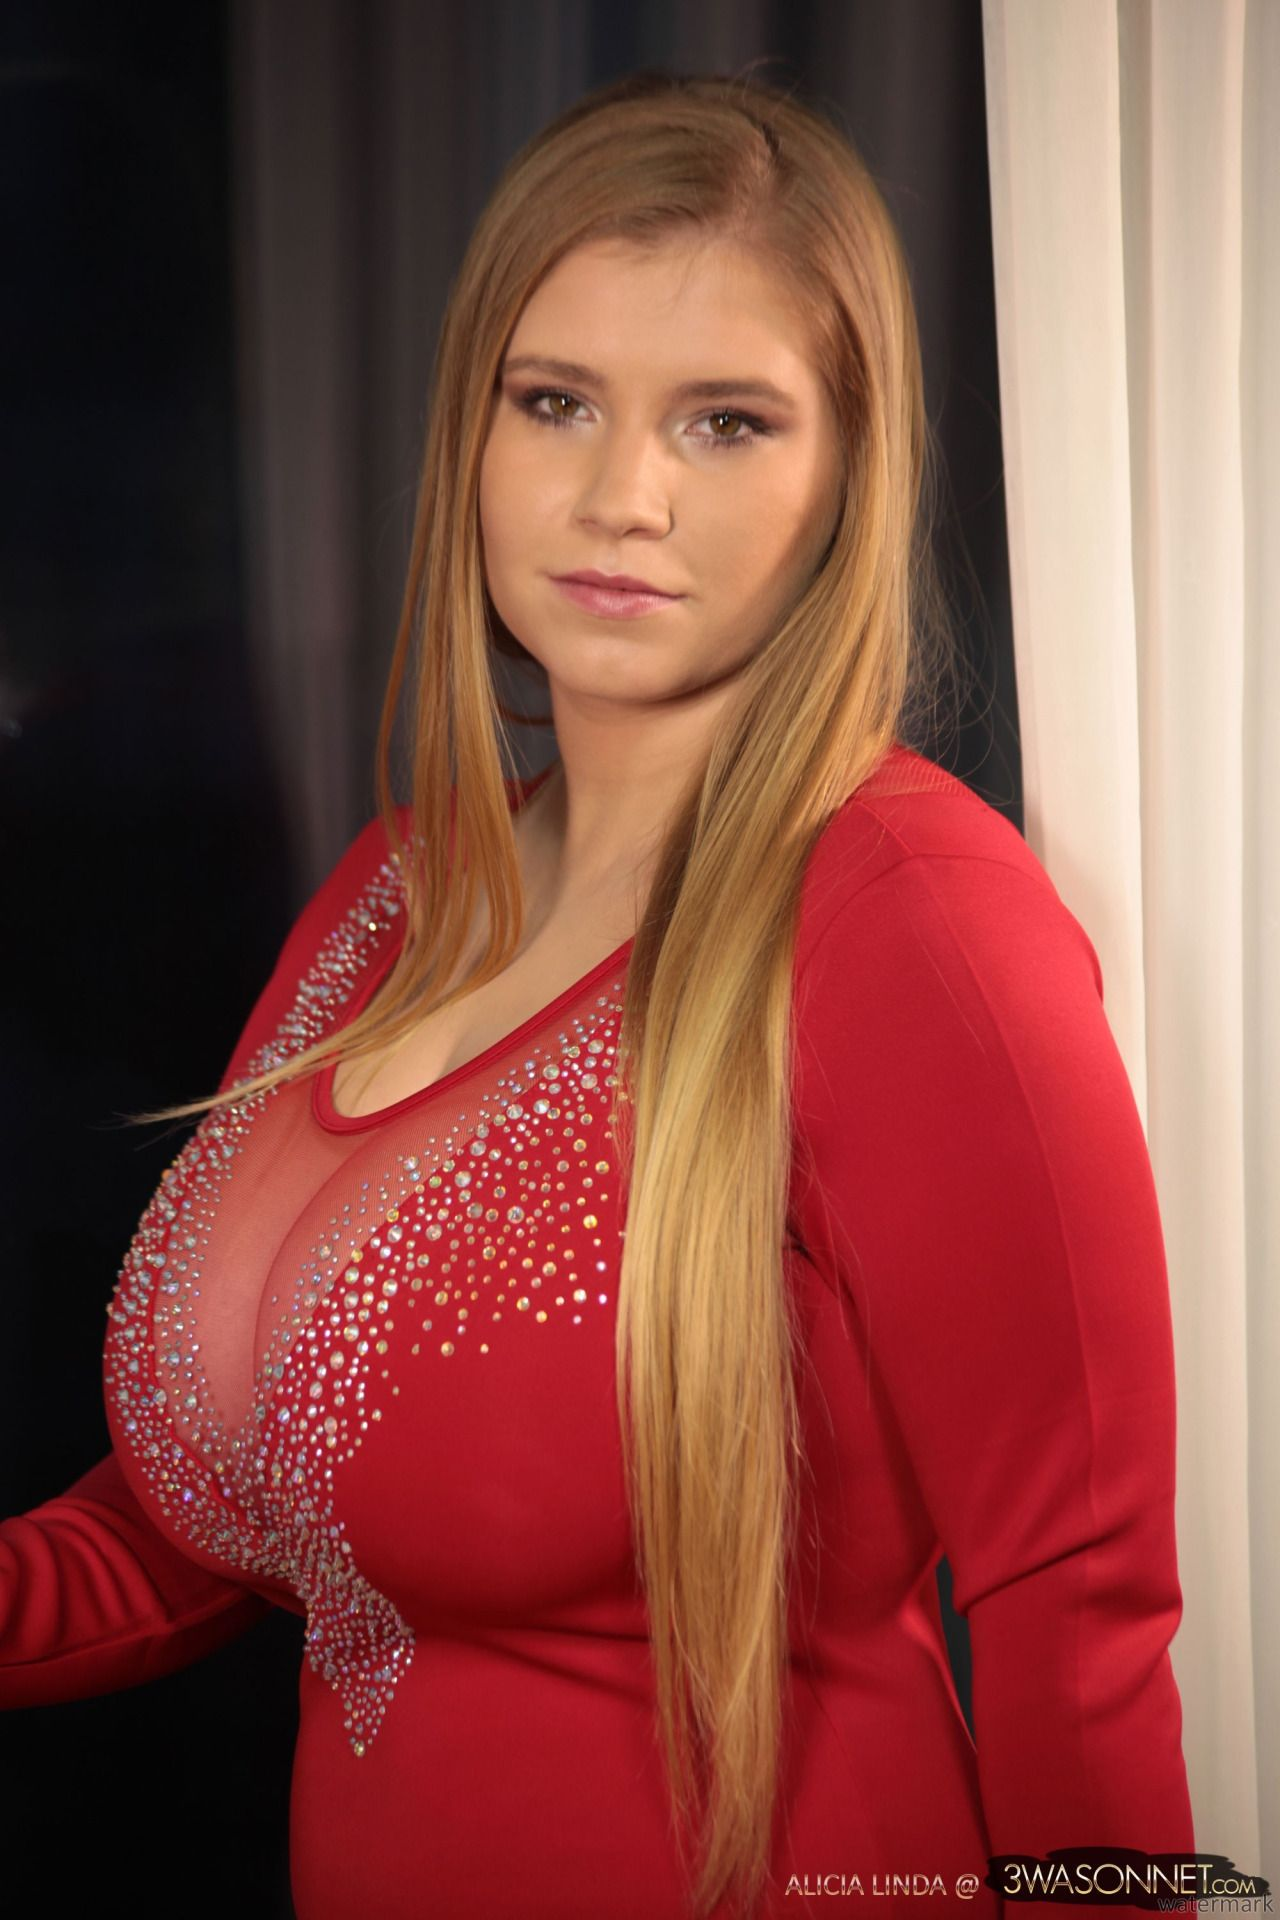 Alicia linda